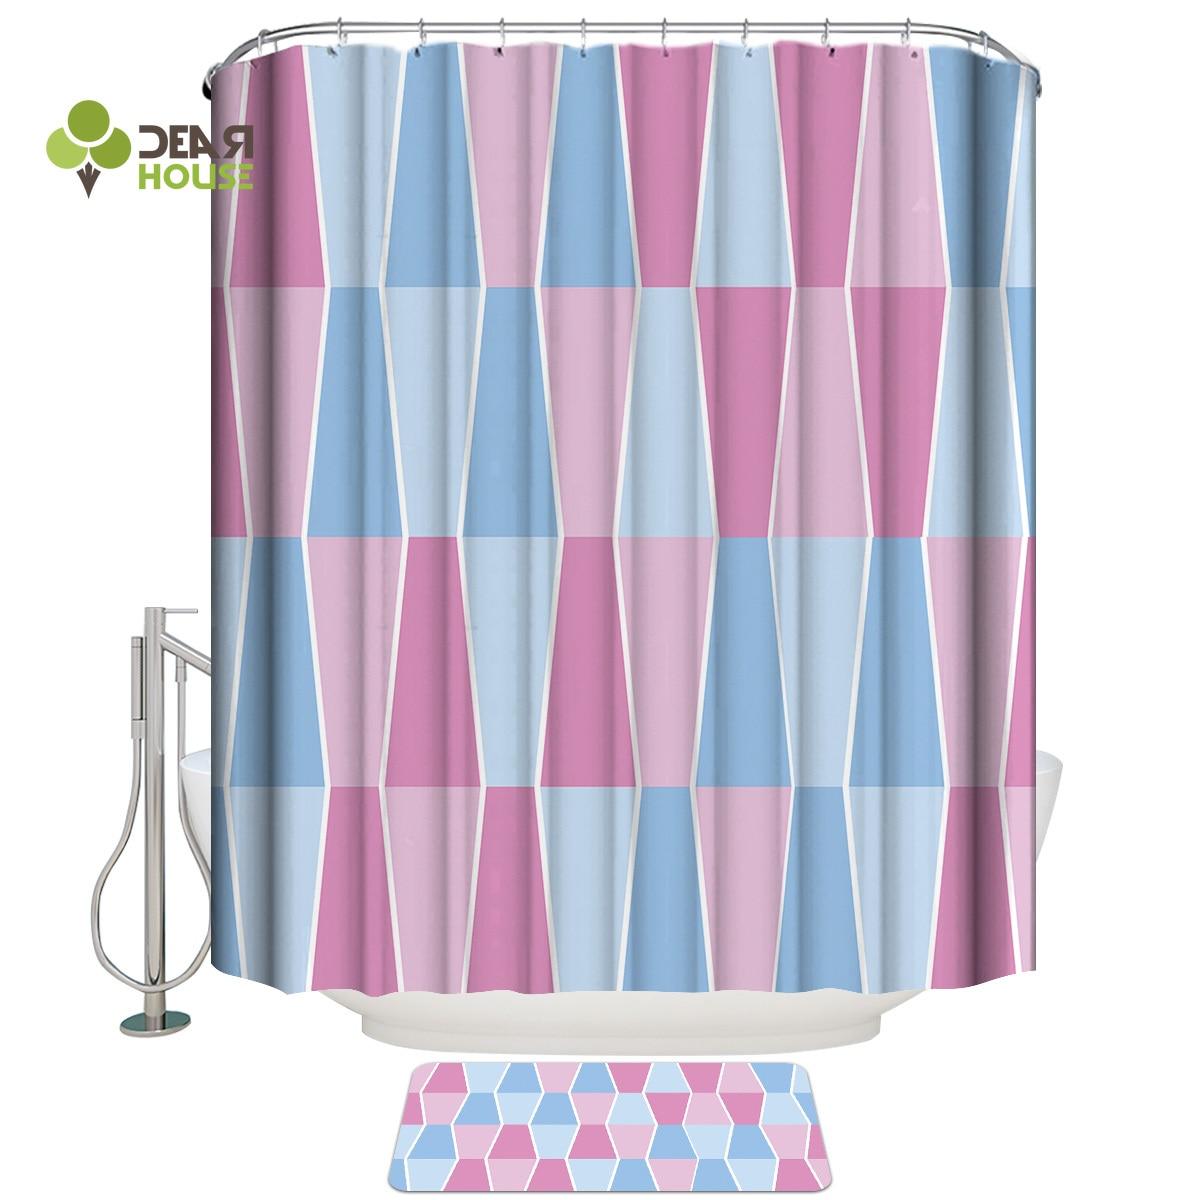 dear house shower curtain and mat set geometric stitching pink blue shower curtain set waterproof fabric